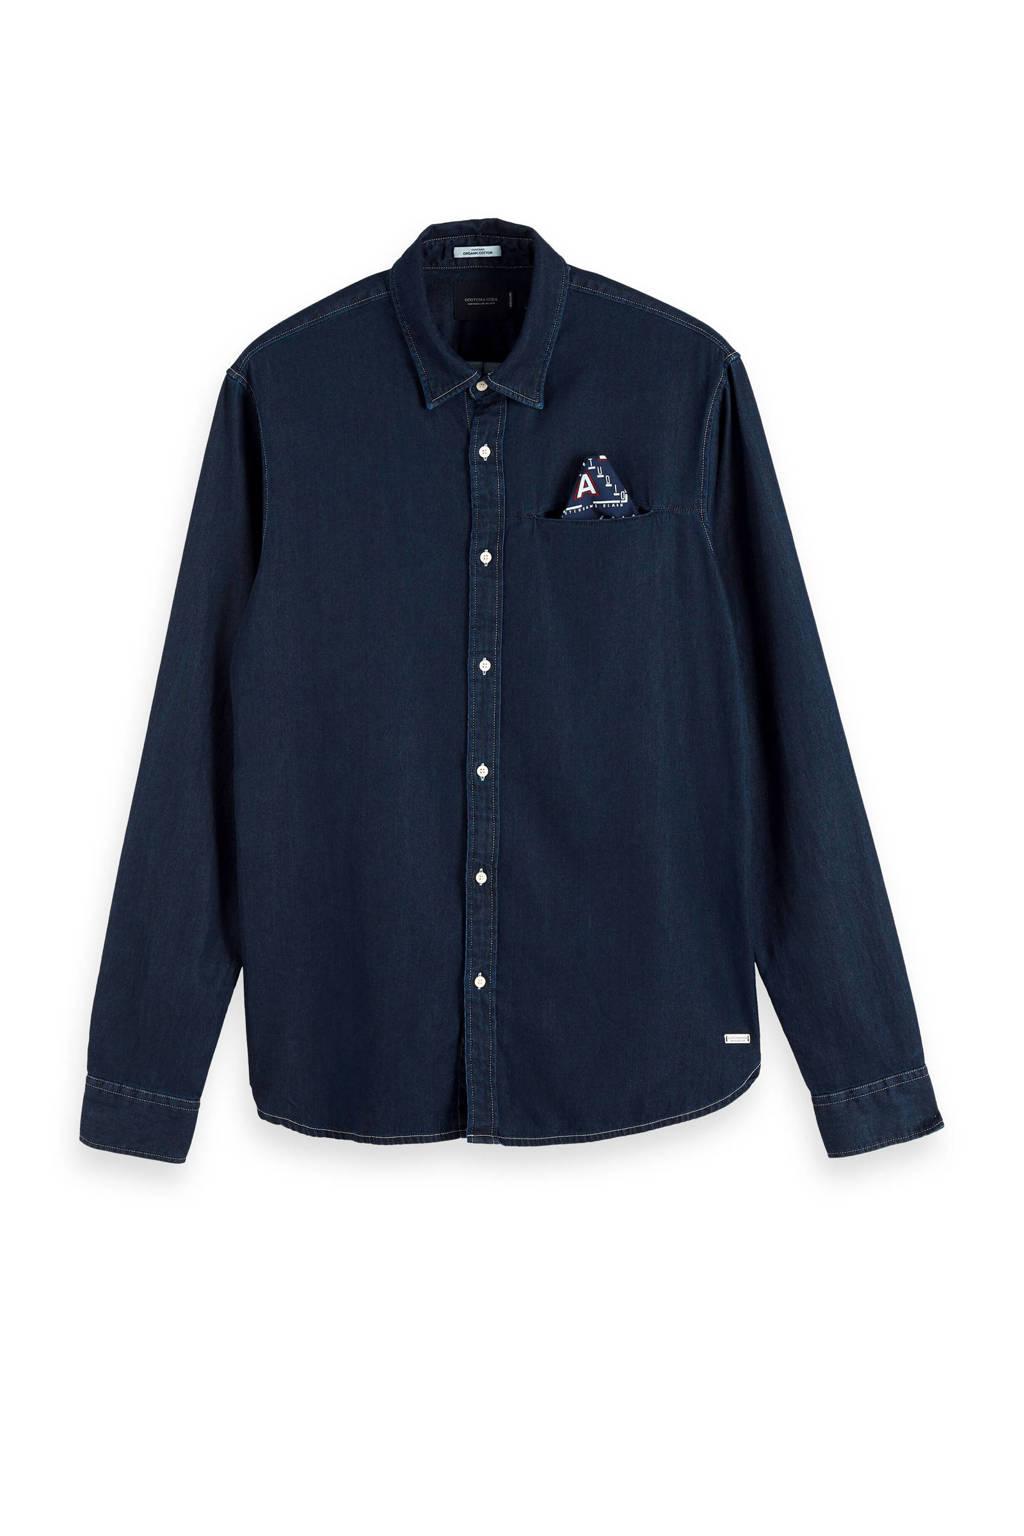 Scotch & Soda Amsterdams Blauw regular fit overhemd dark denim, Dark denim